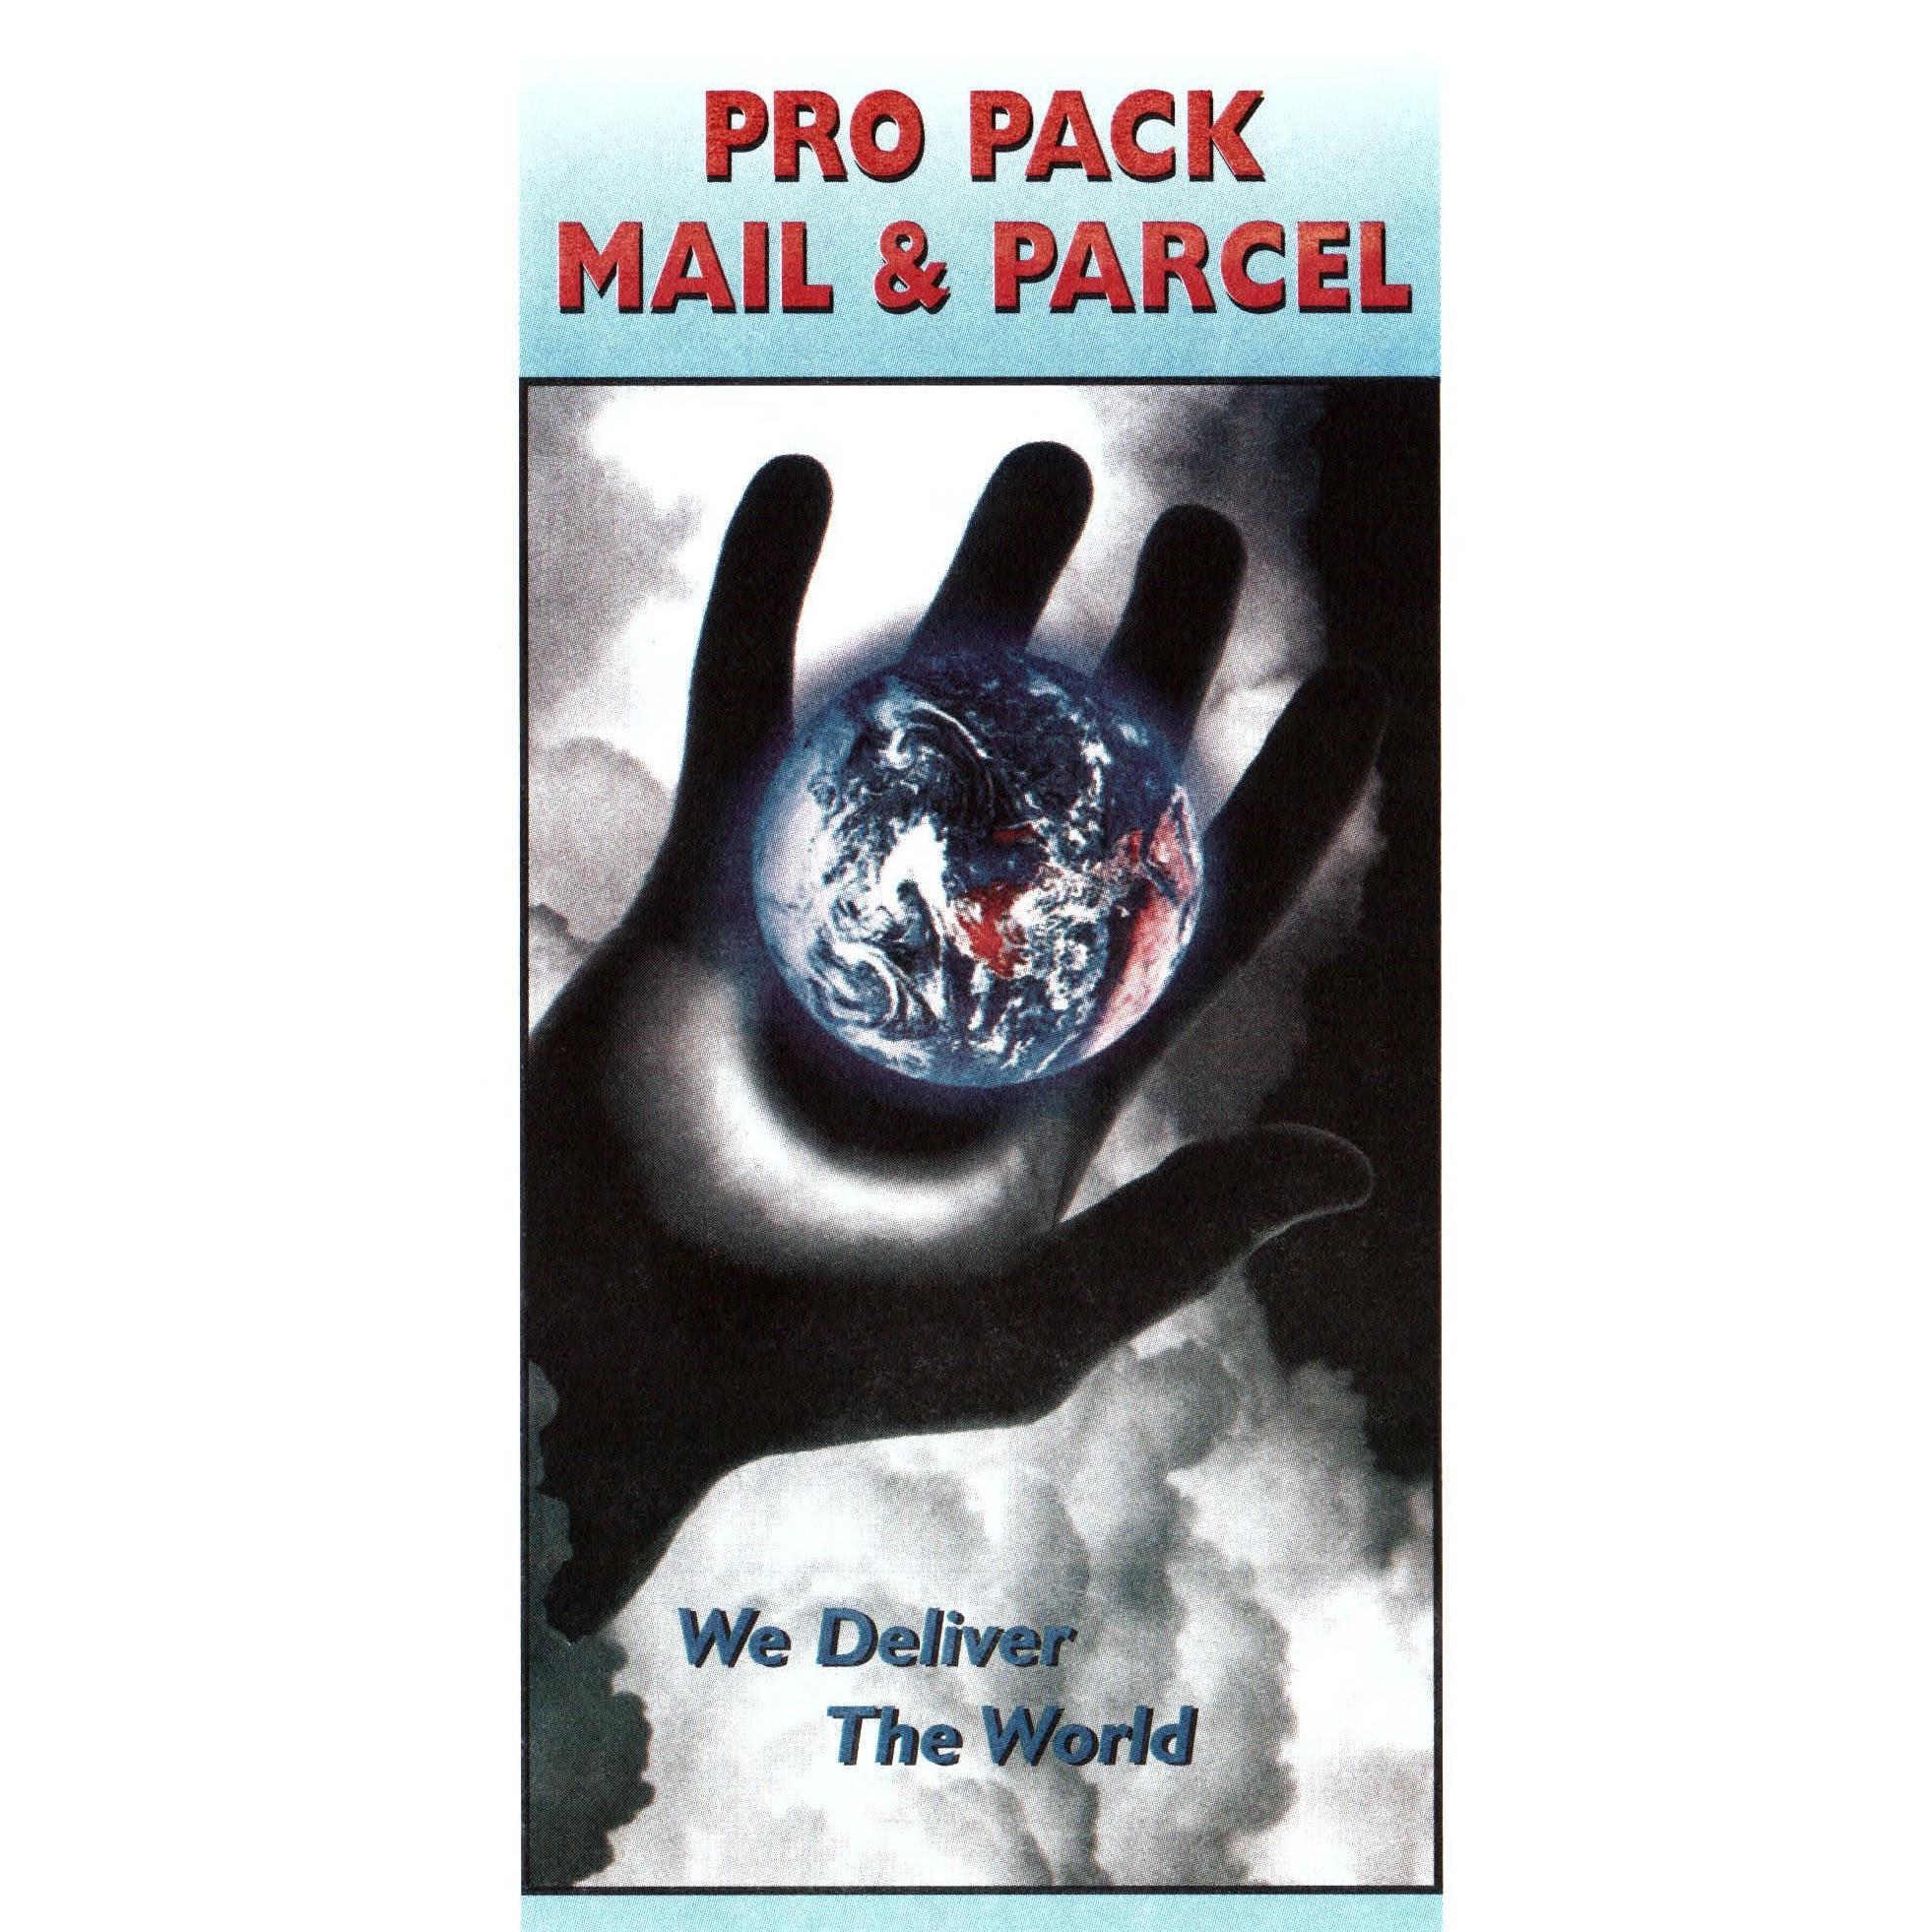 Pro Pack Mail & Parcel Center